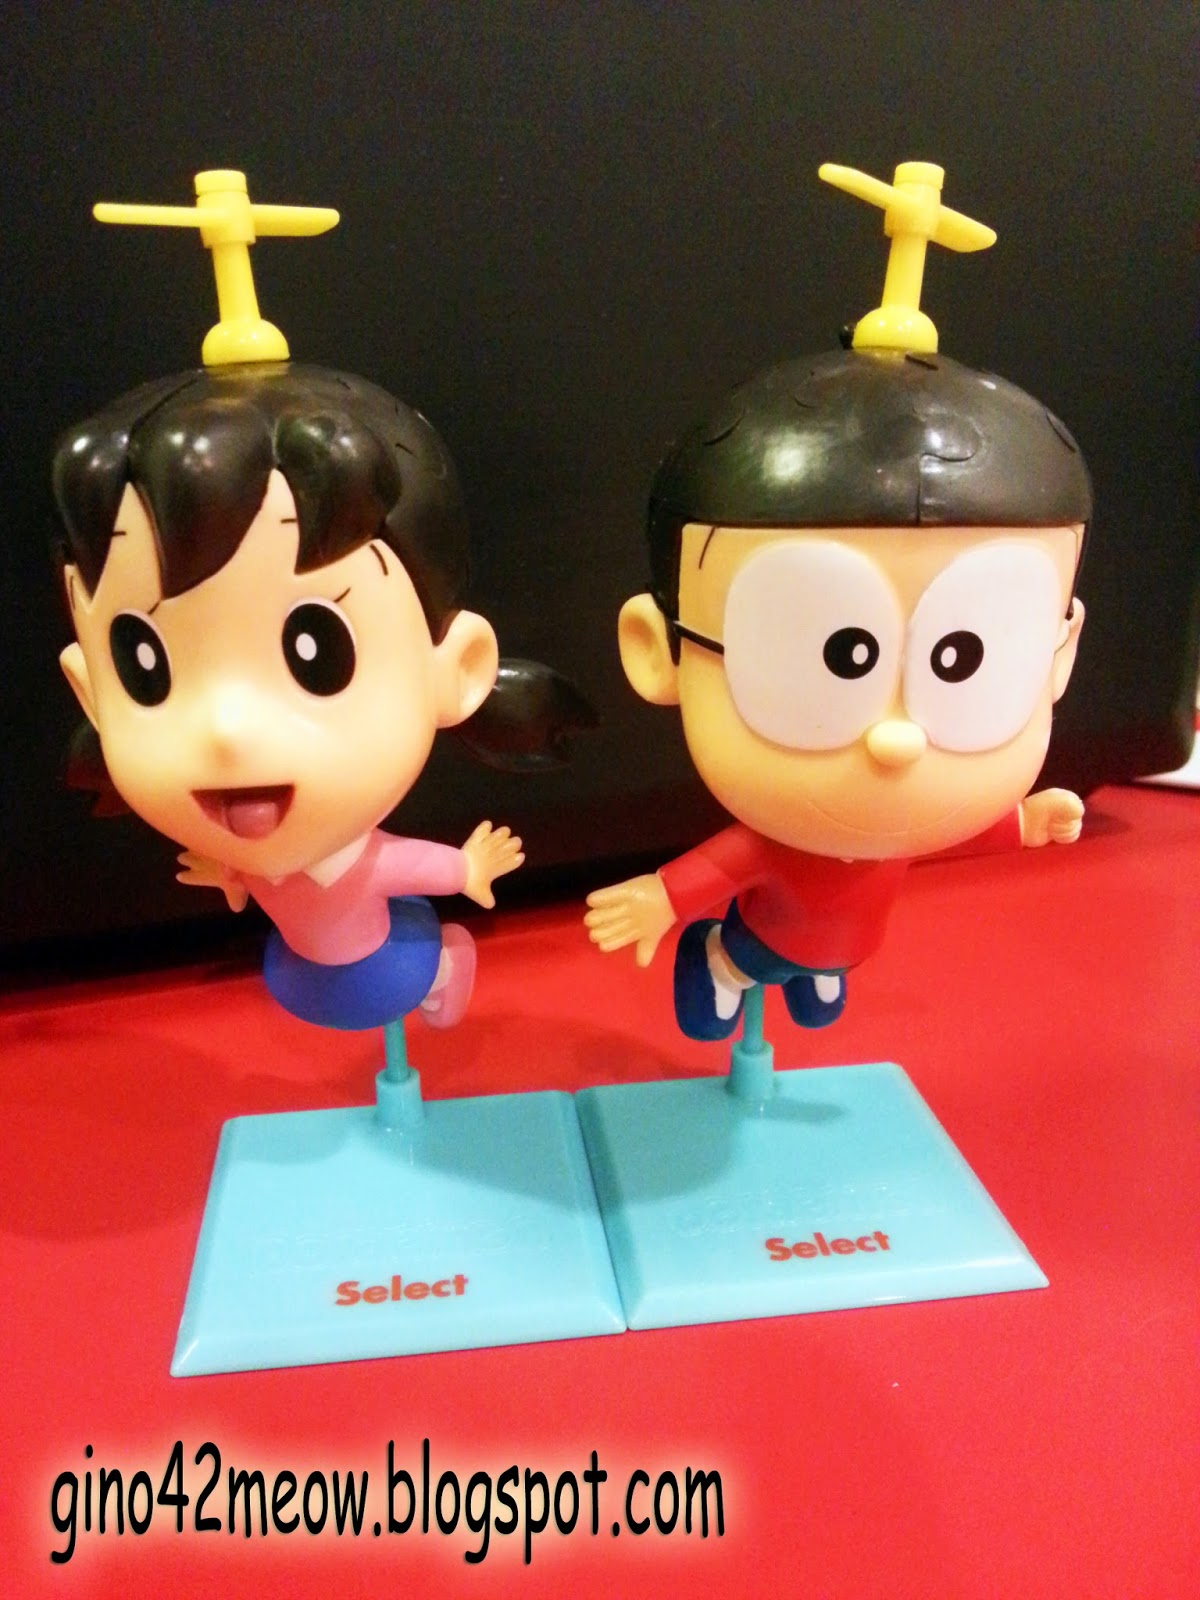 Talkin' 2 MySelf (⊙ ⊙ ): Shell @ The Doraemon Family